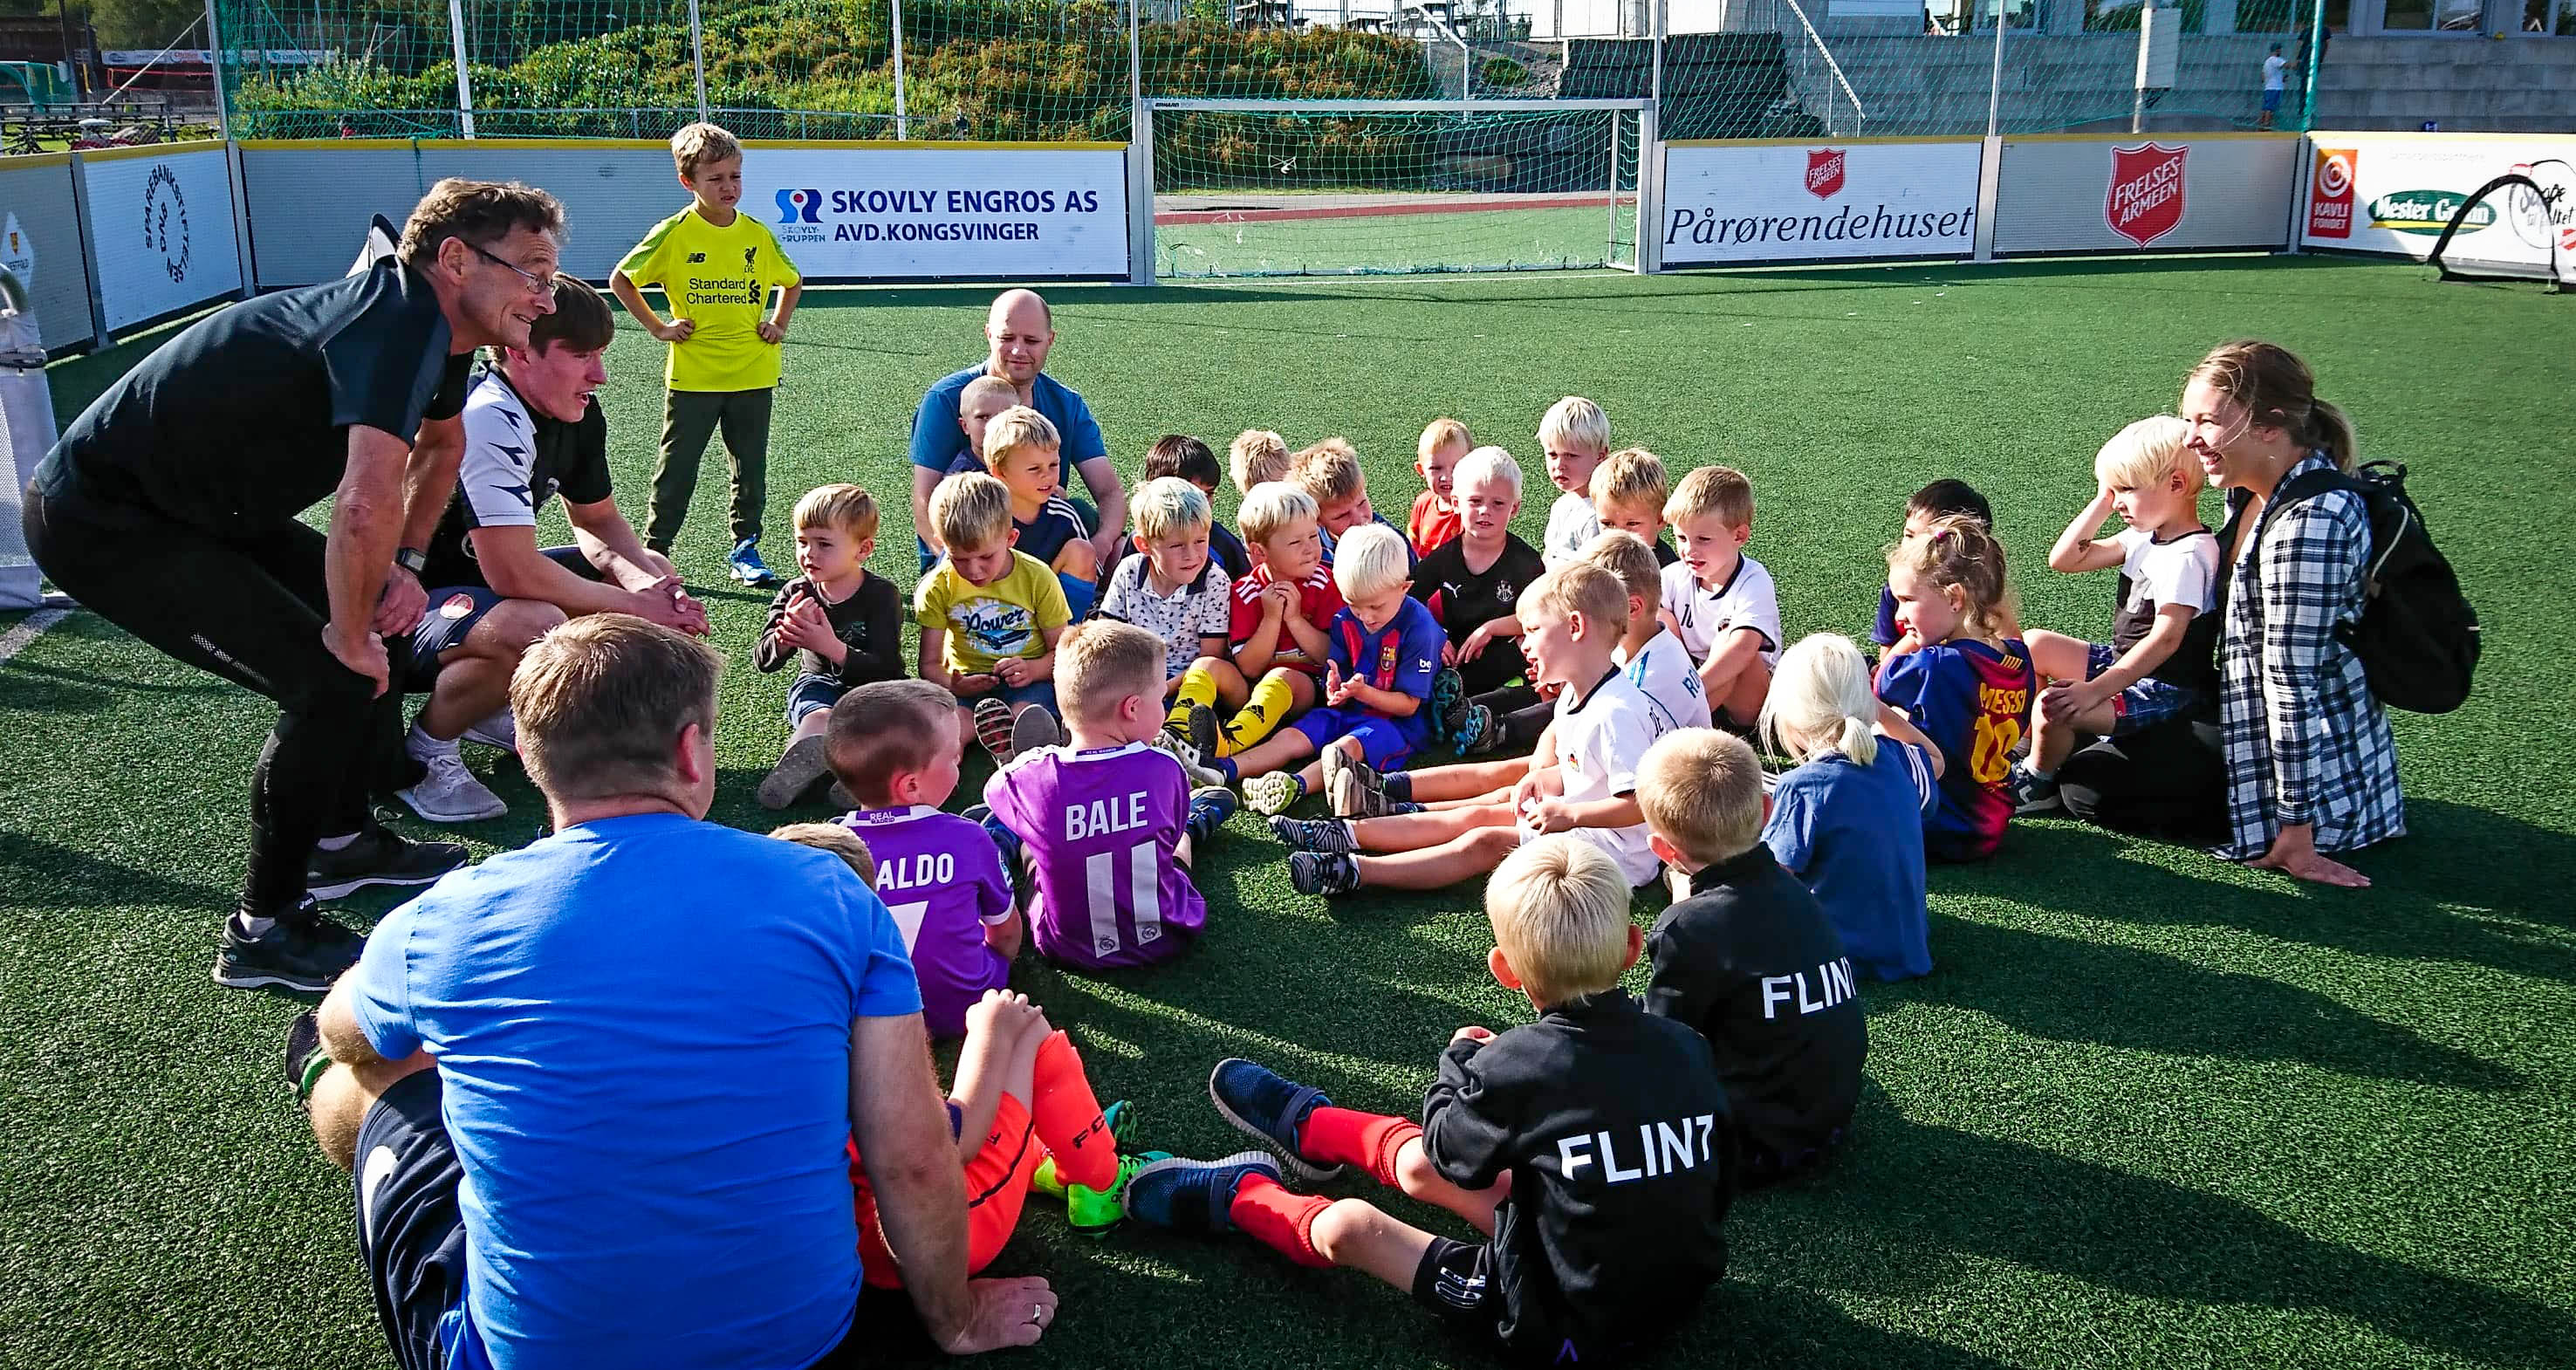 https://www.flintfotball.no/wp-content/uploads/2019/08/fotball-for-4-5.jpg